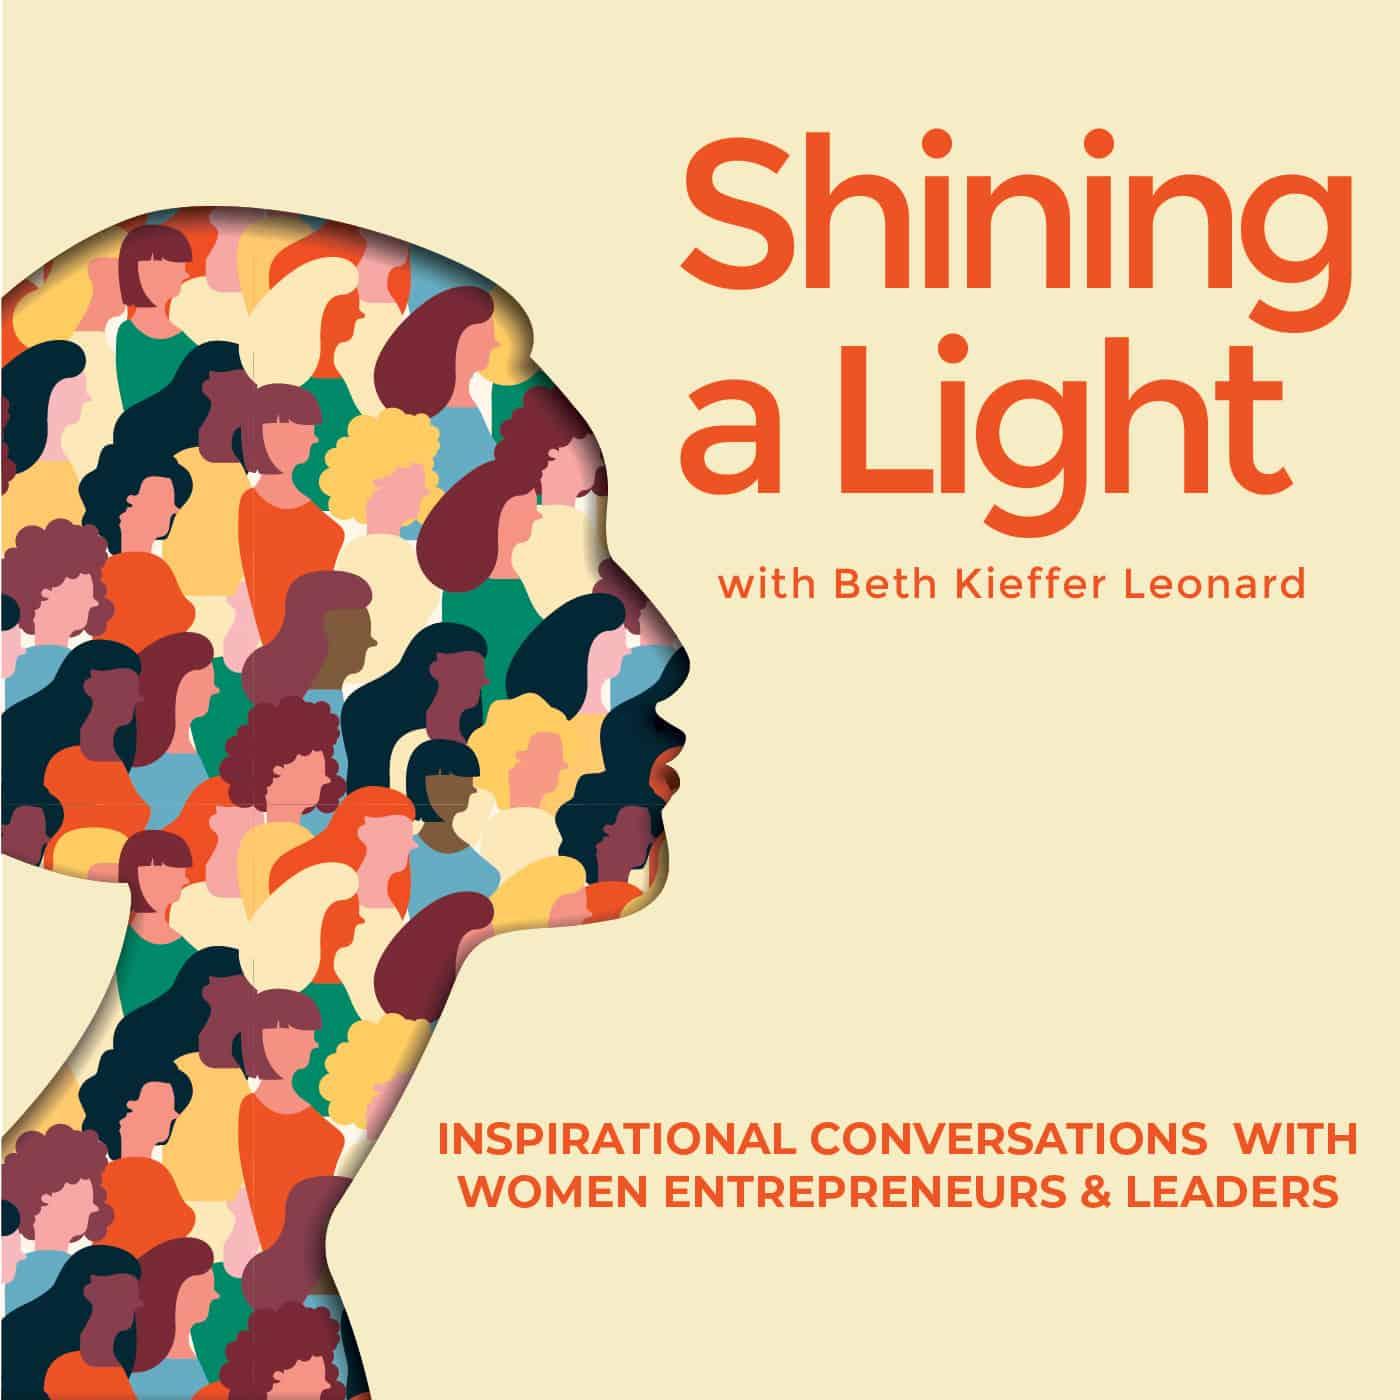 Shining a Light with Beth Kieffer Leonard